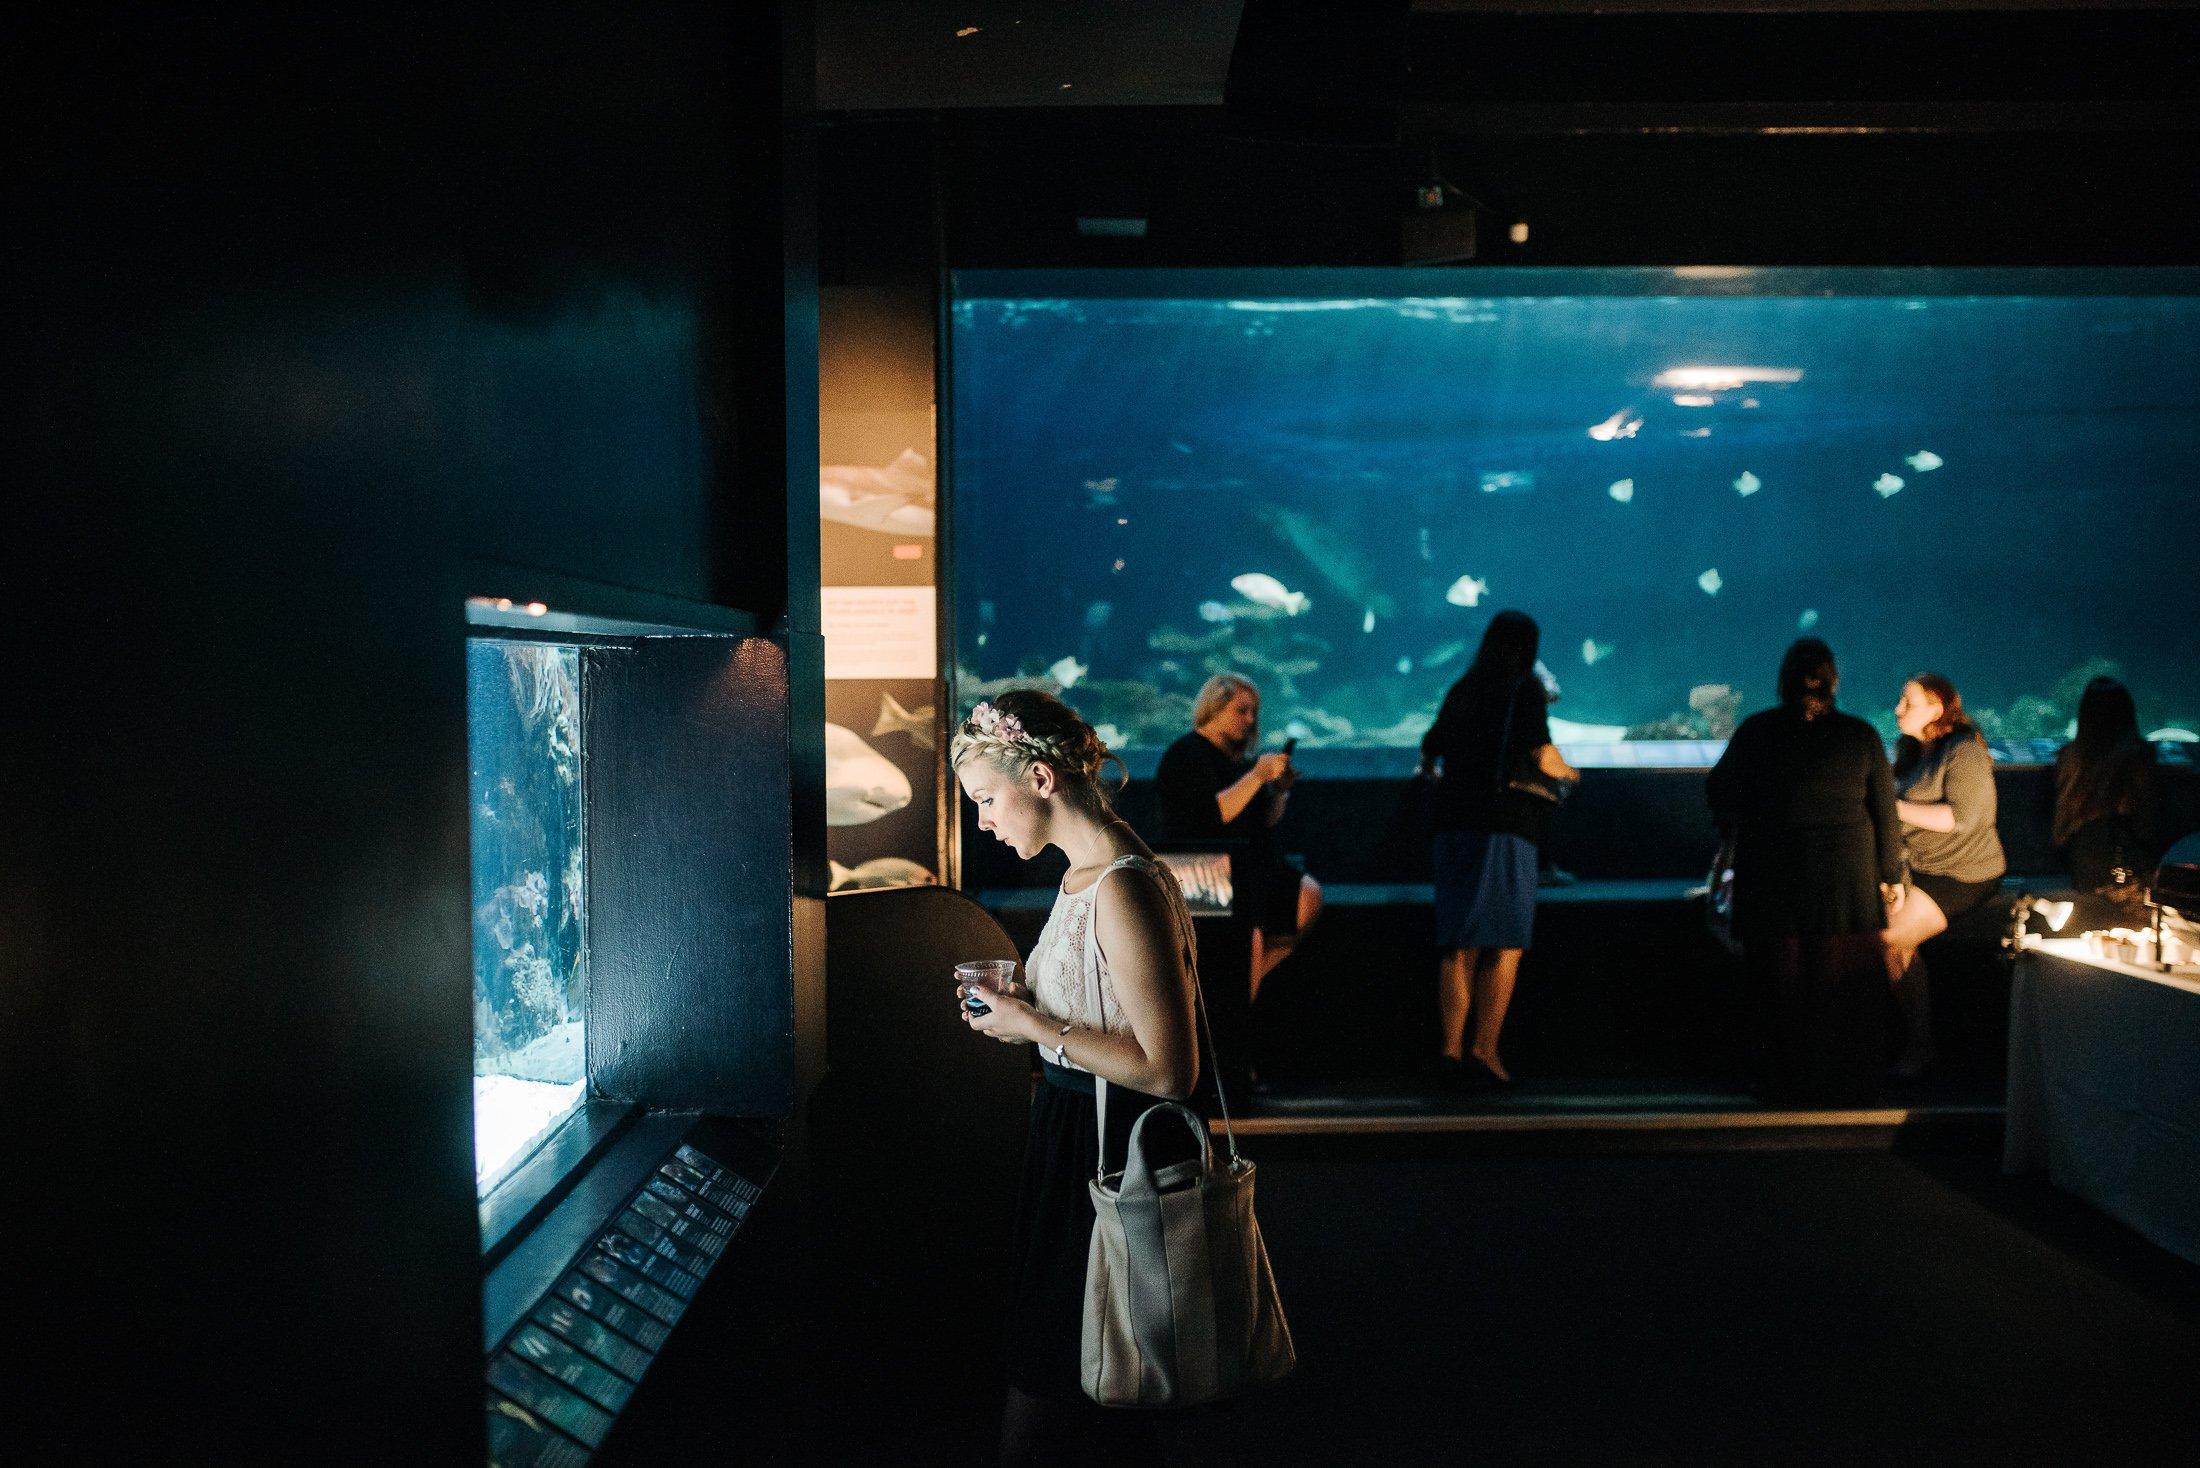 Fish aquarium vancouver - Guests Check Out The Fish At The Vancouver Aquarium